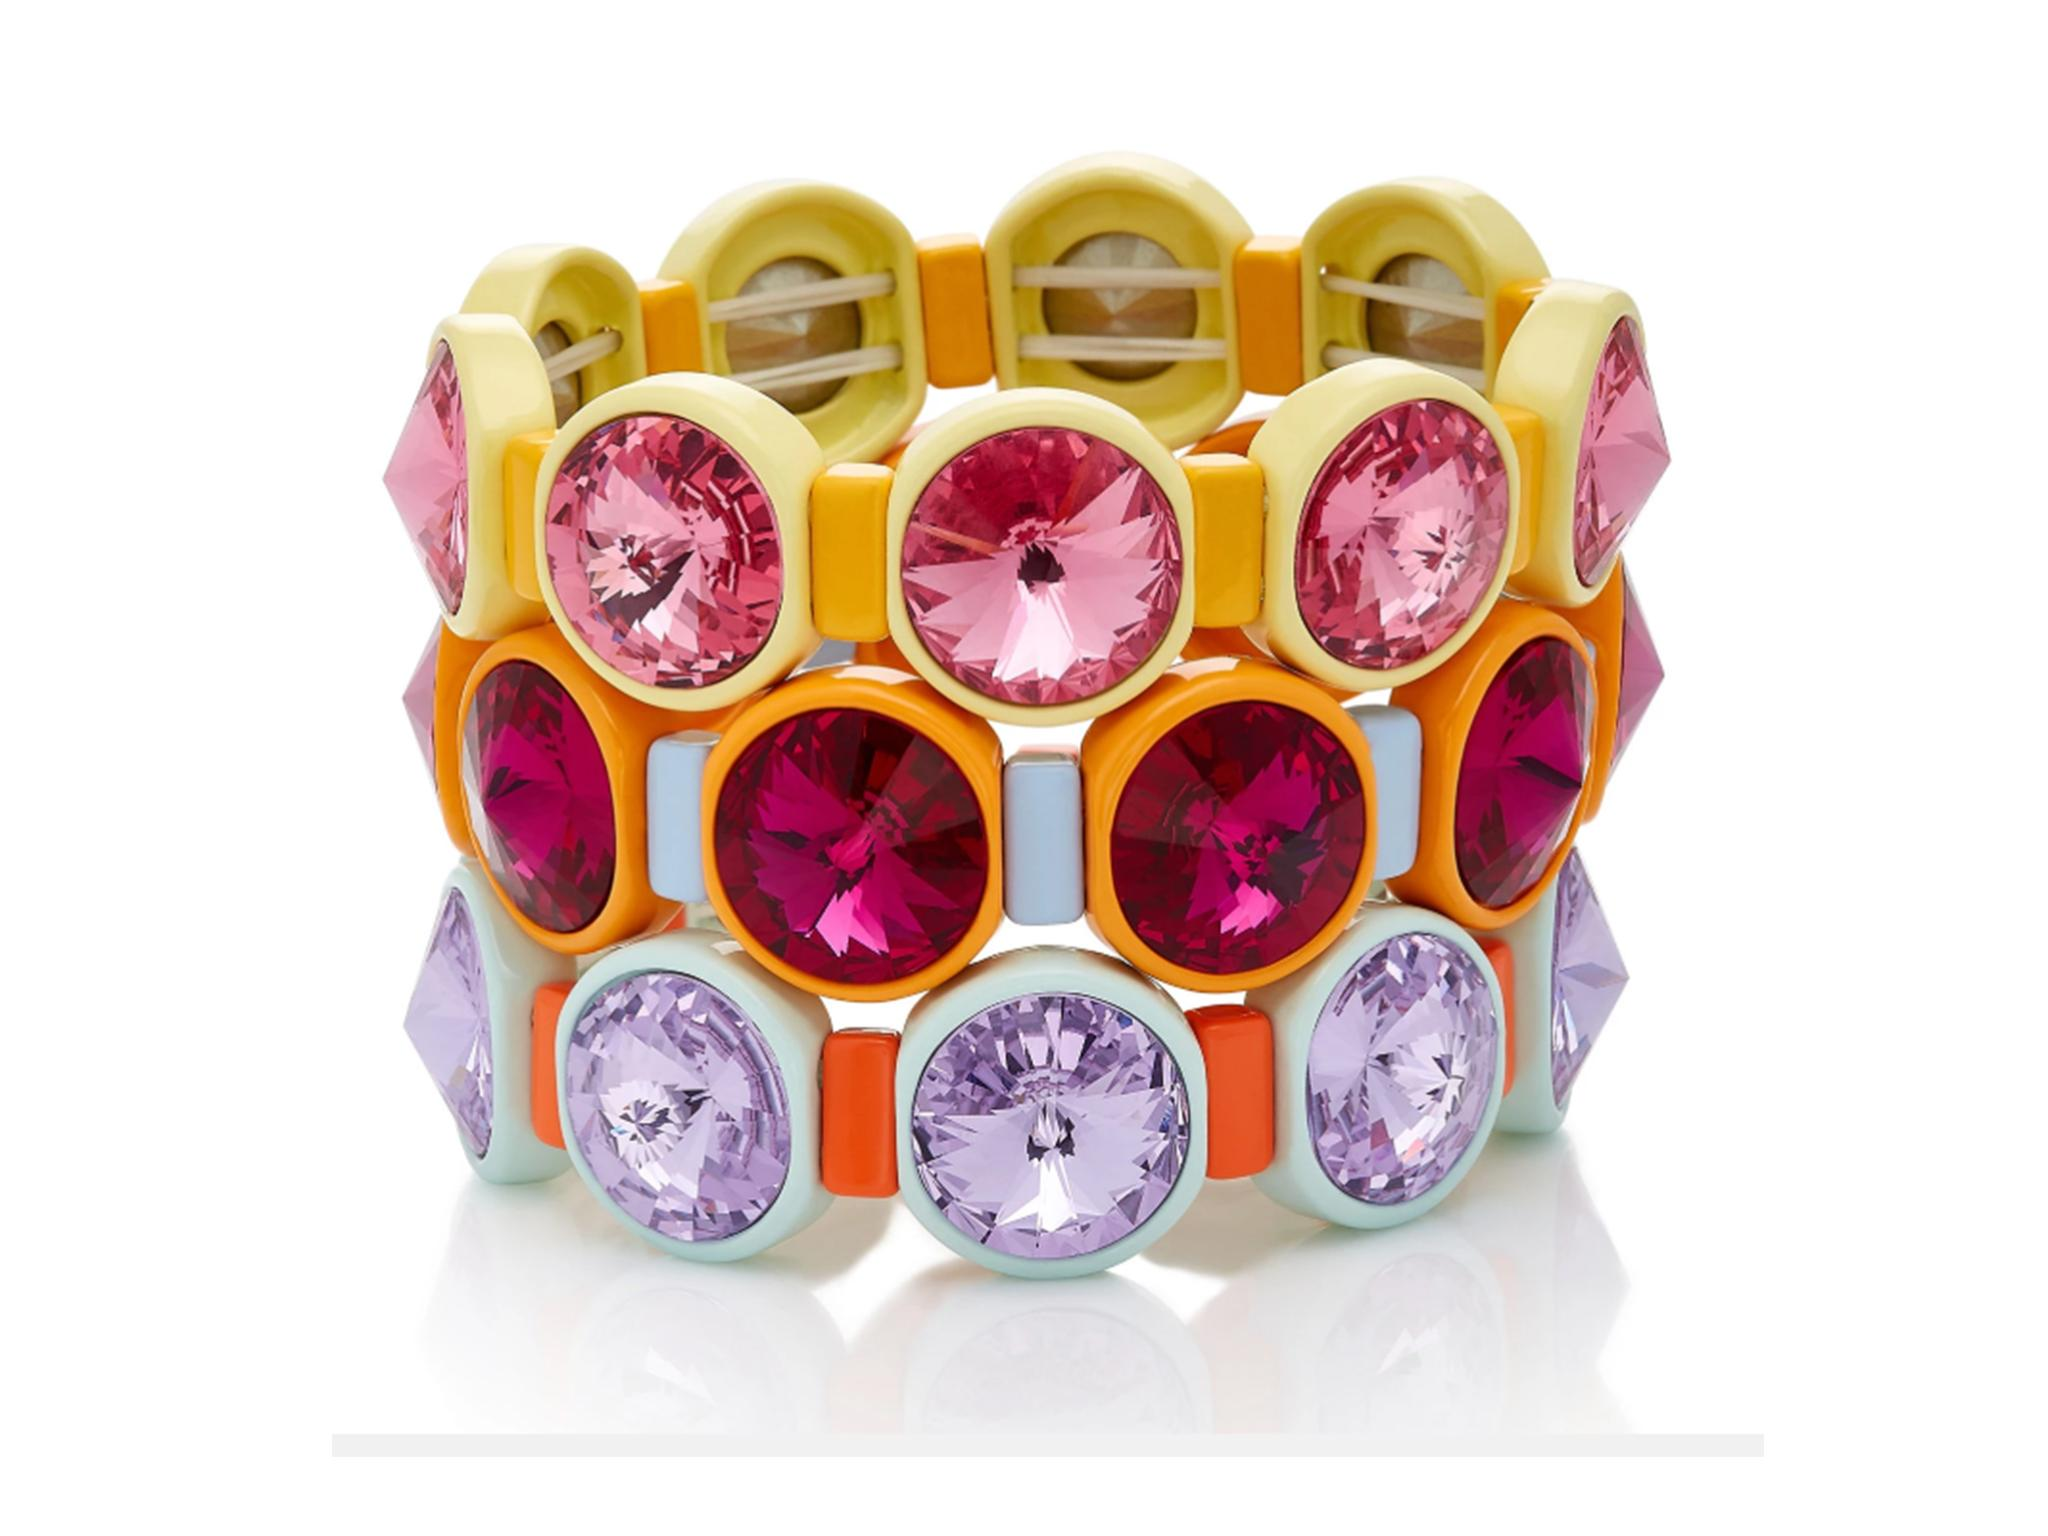 10 Best off the radar jewellery brands